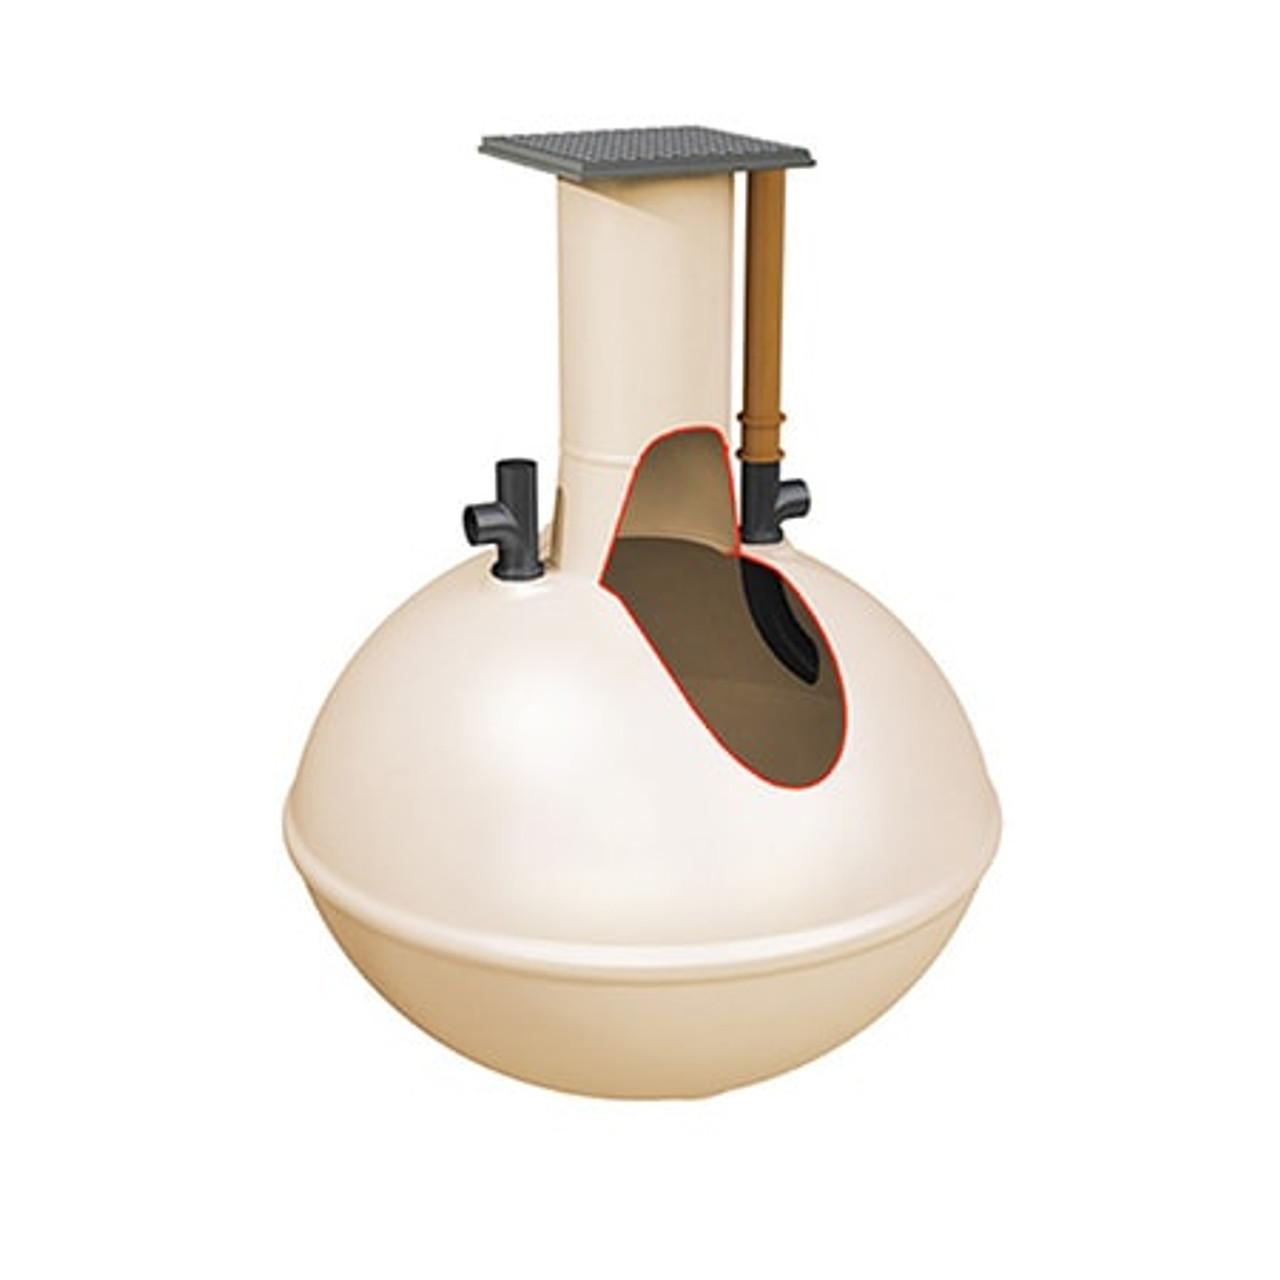 300 gallon spherical septic tank